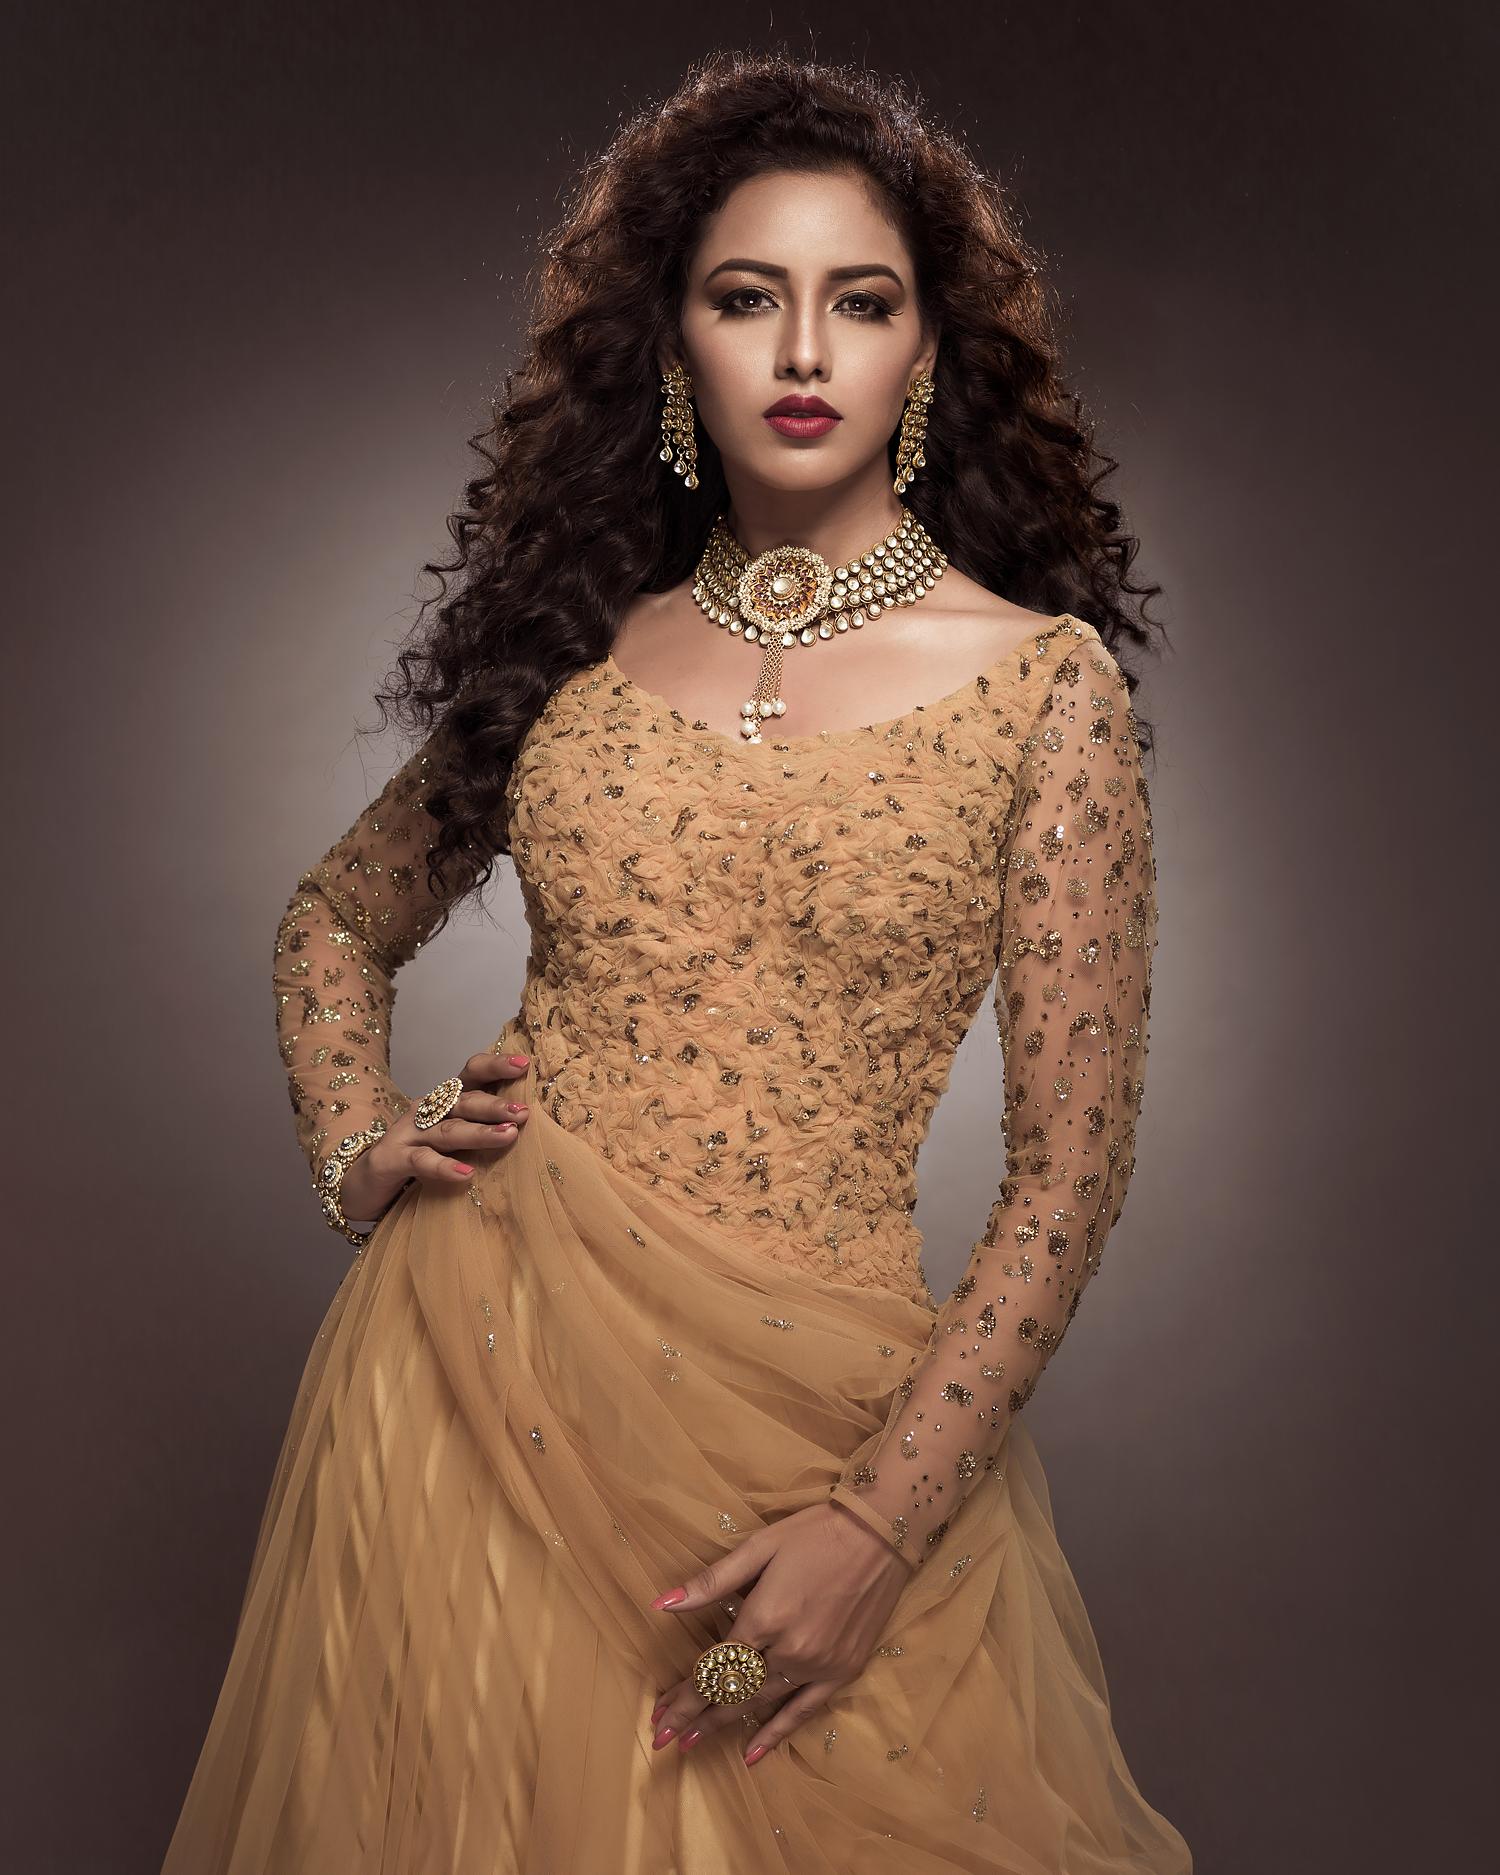 Female Model Portfolio By Vipin Gaur Photography